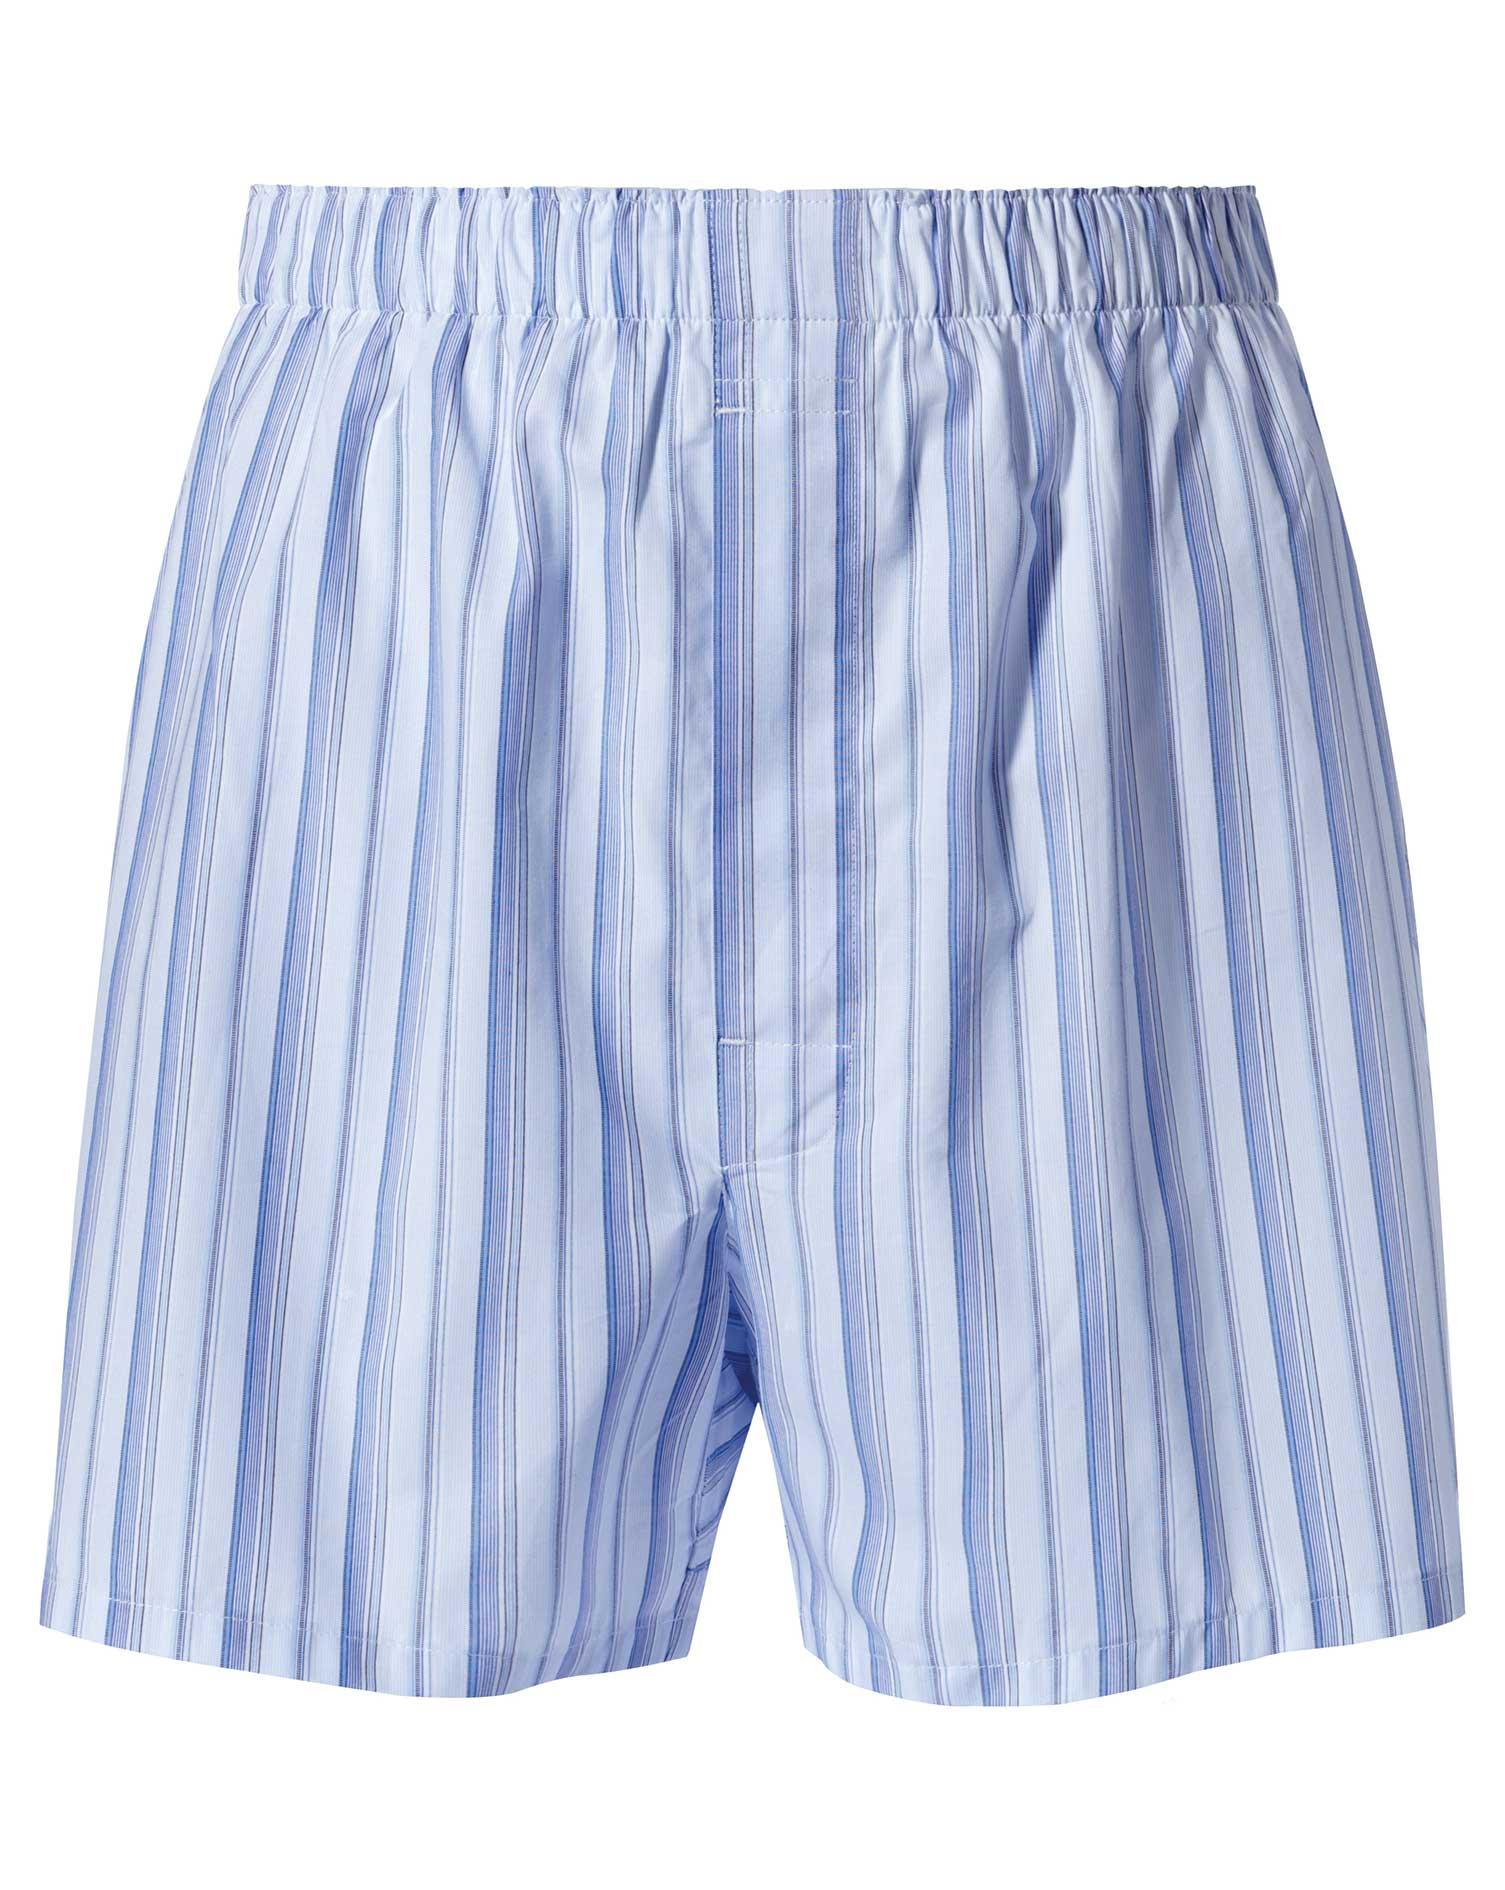 Sky Blue Stripe Woven Boxers Size XL by Charles Tyrwhitt